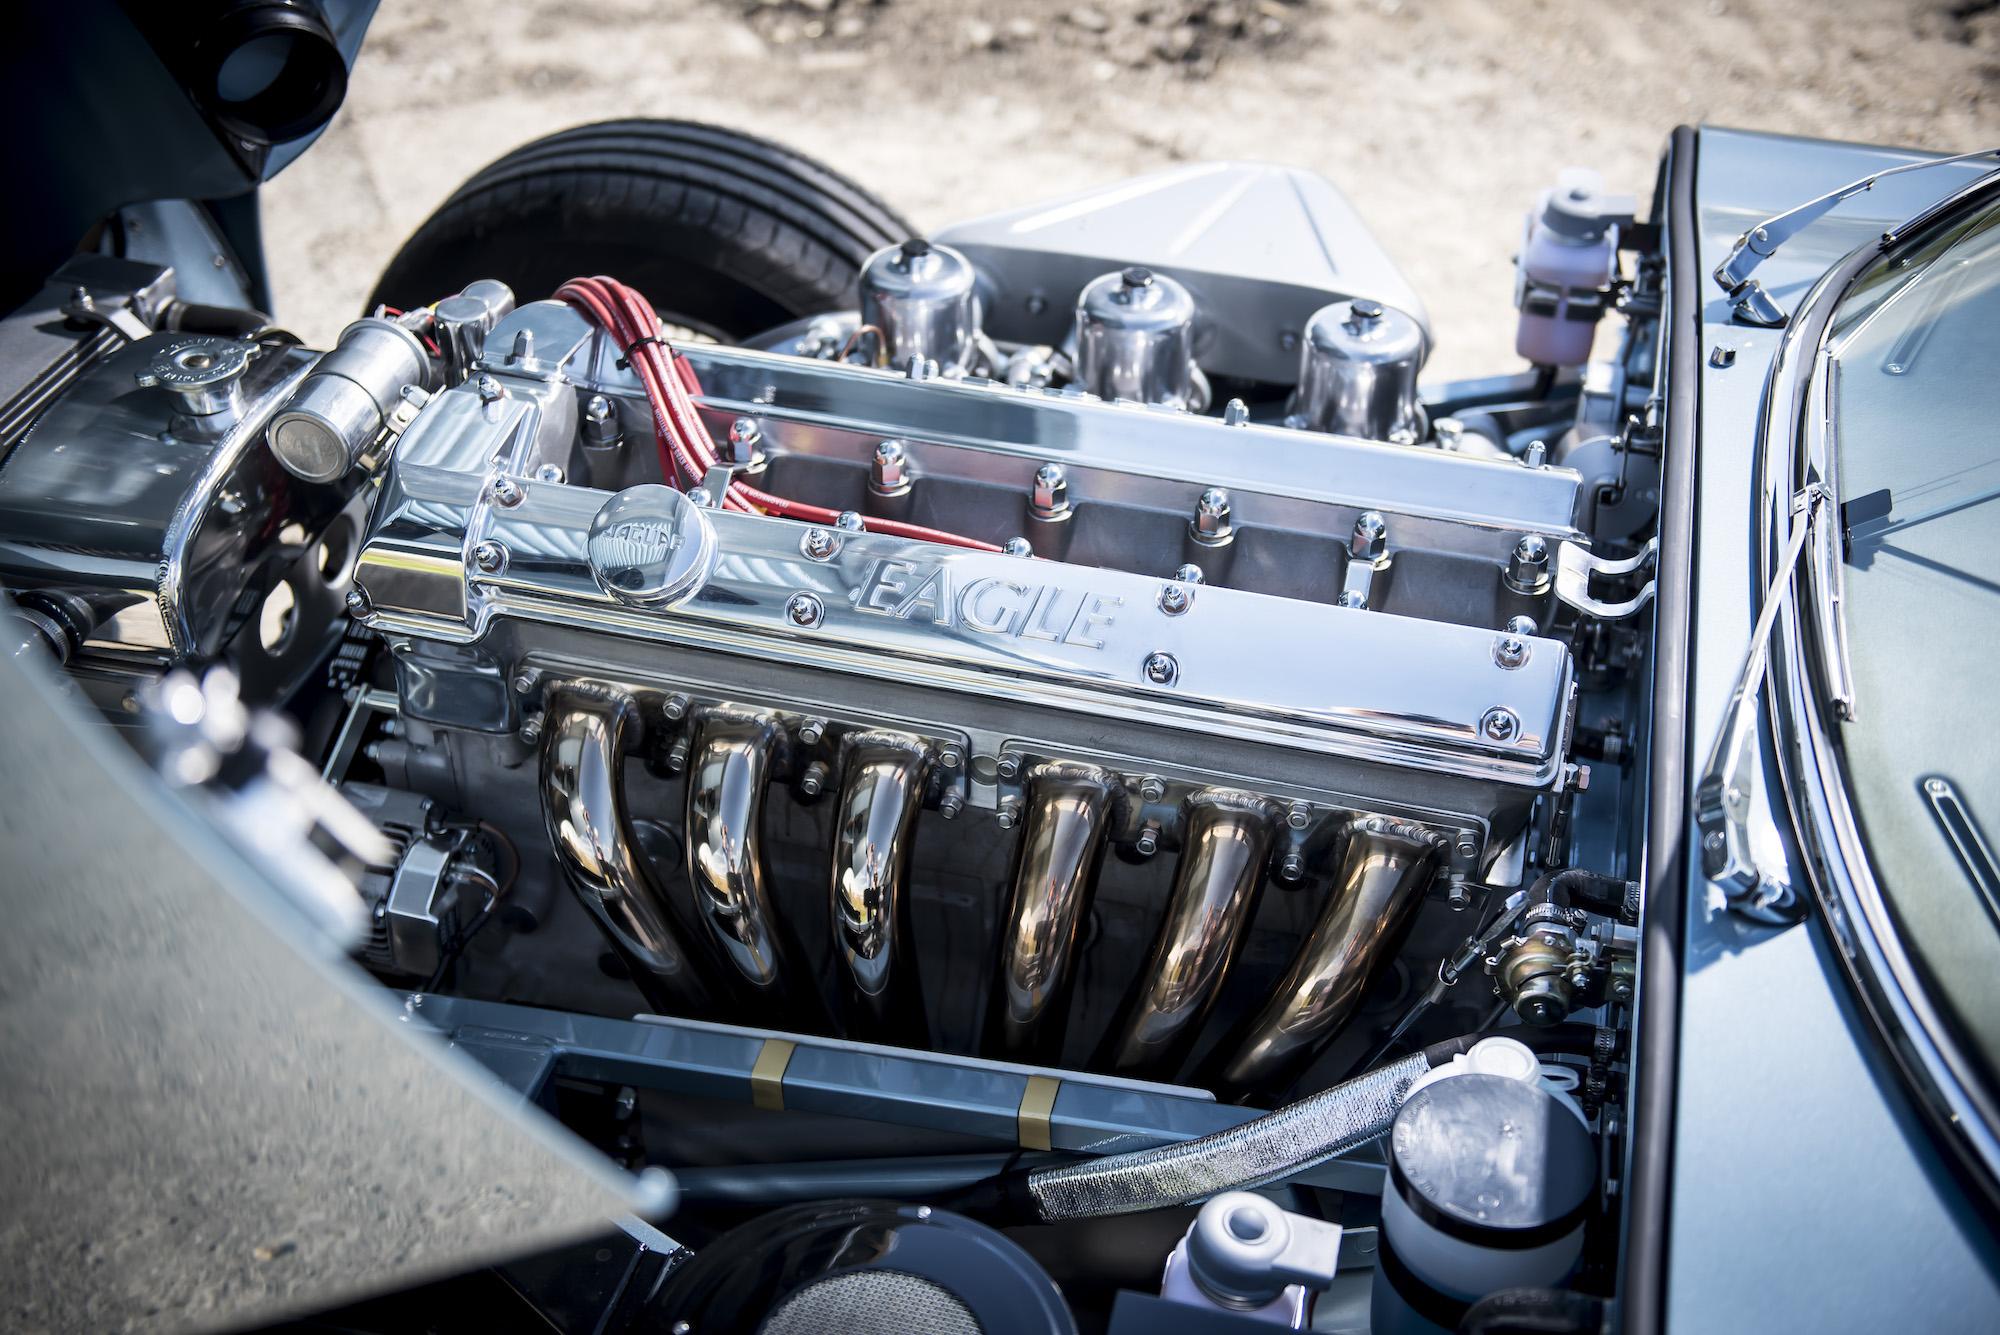 r car photos sport driver engines jaguar reviews price and xe specs awd